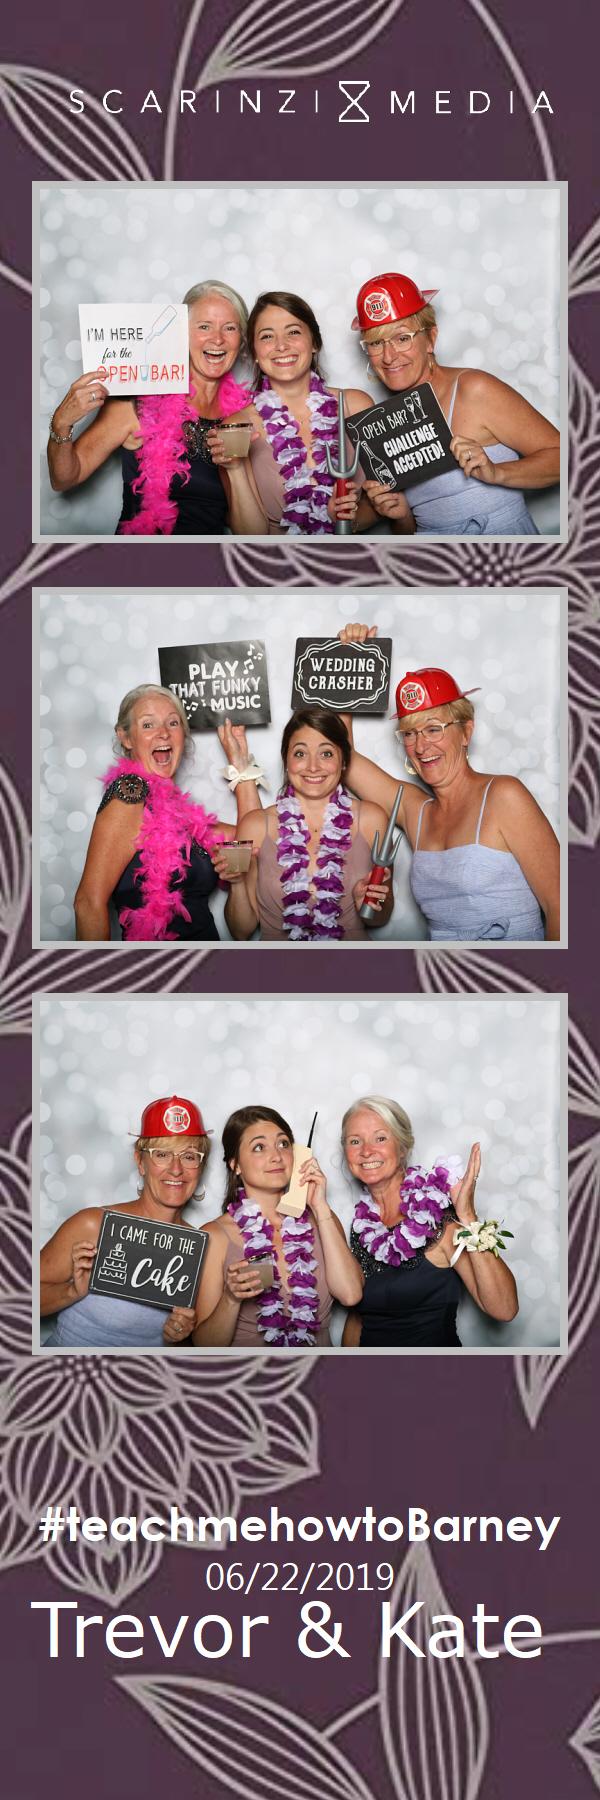 2019.06.22 - Barney Wedding PHOTOBOOTH03.jpg